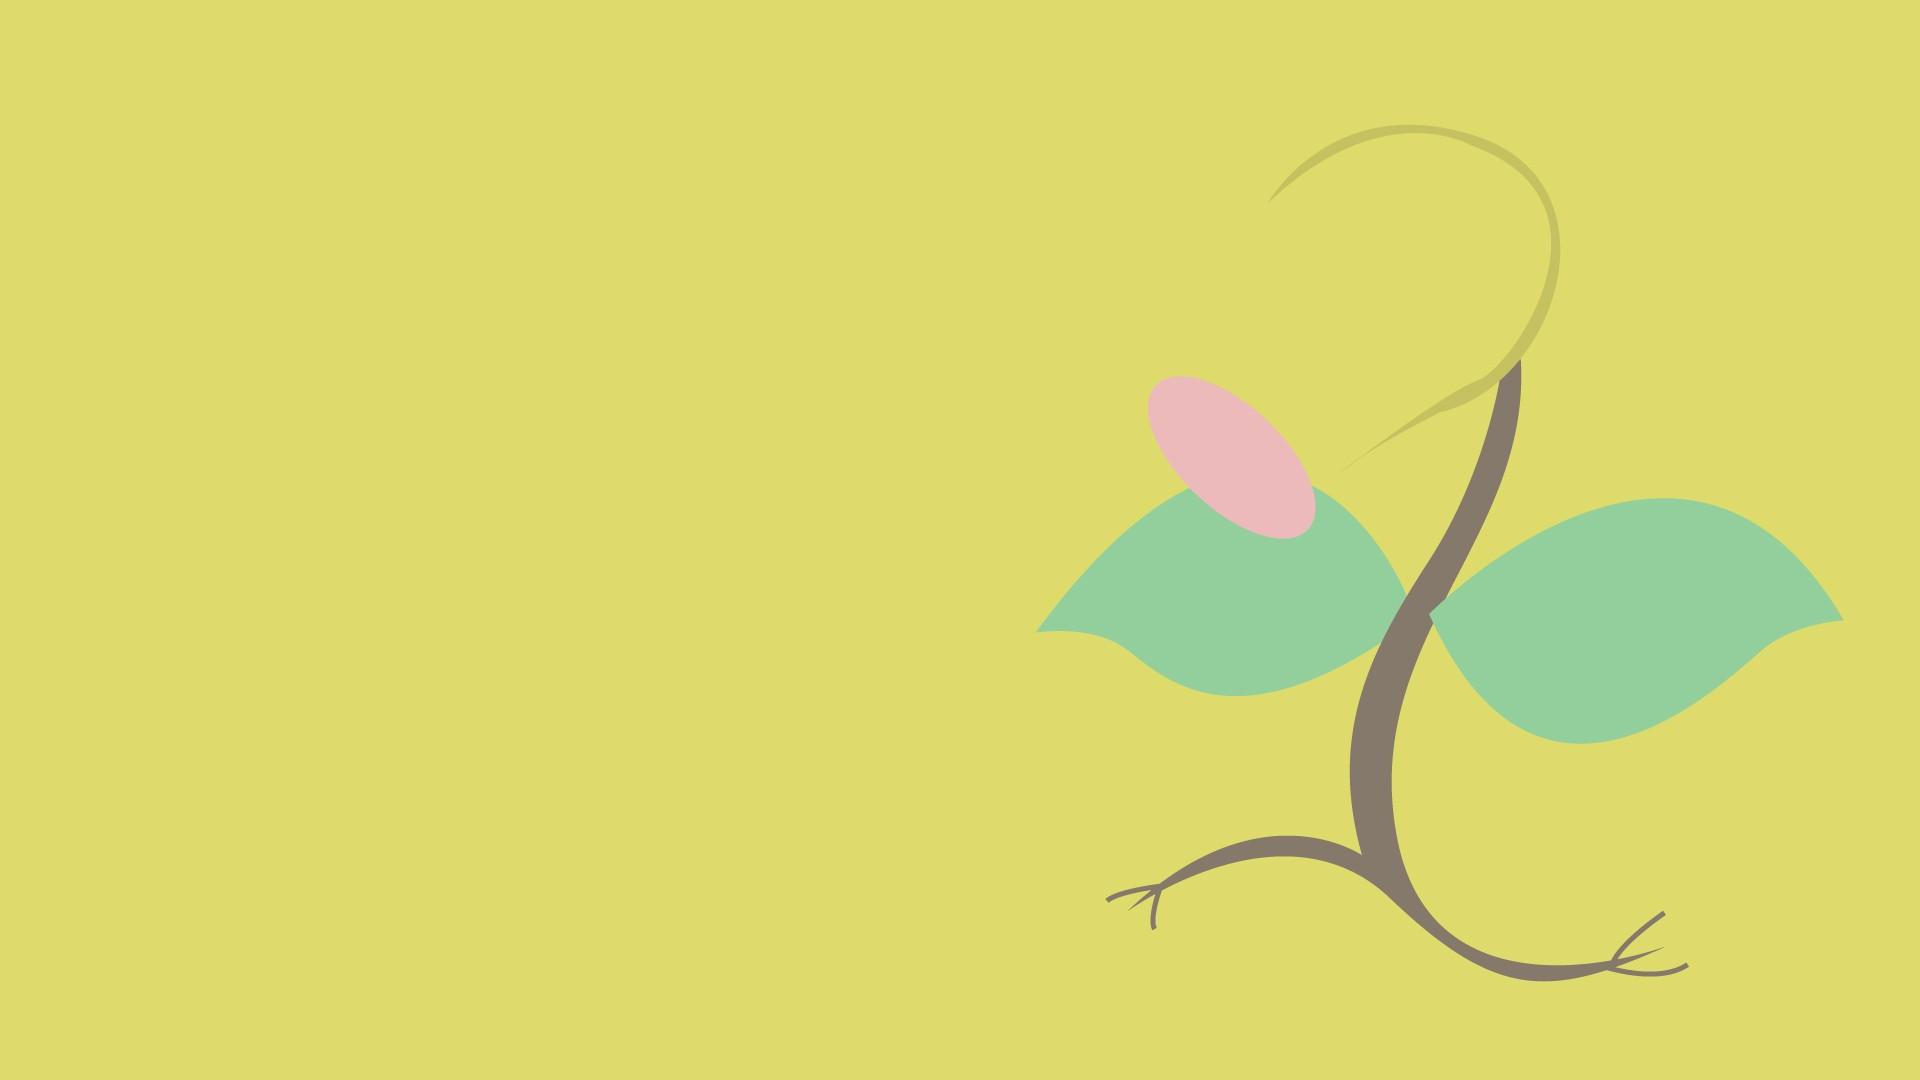 Wallpaper Illustration Minimalism Text Logo Branch Yellow